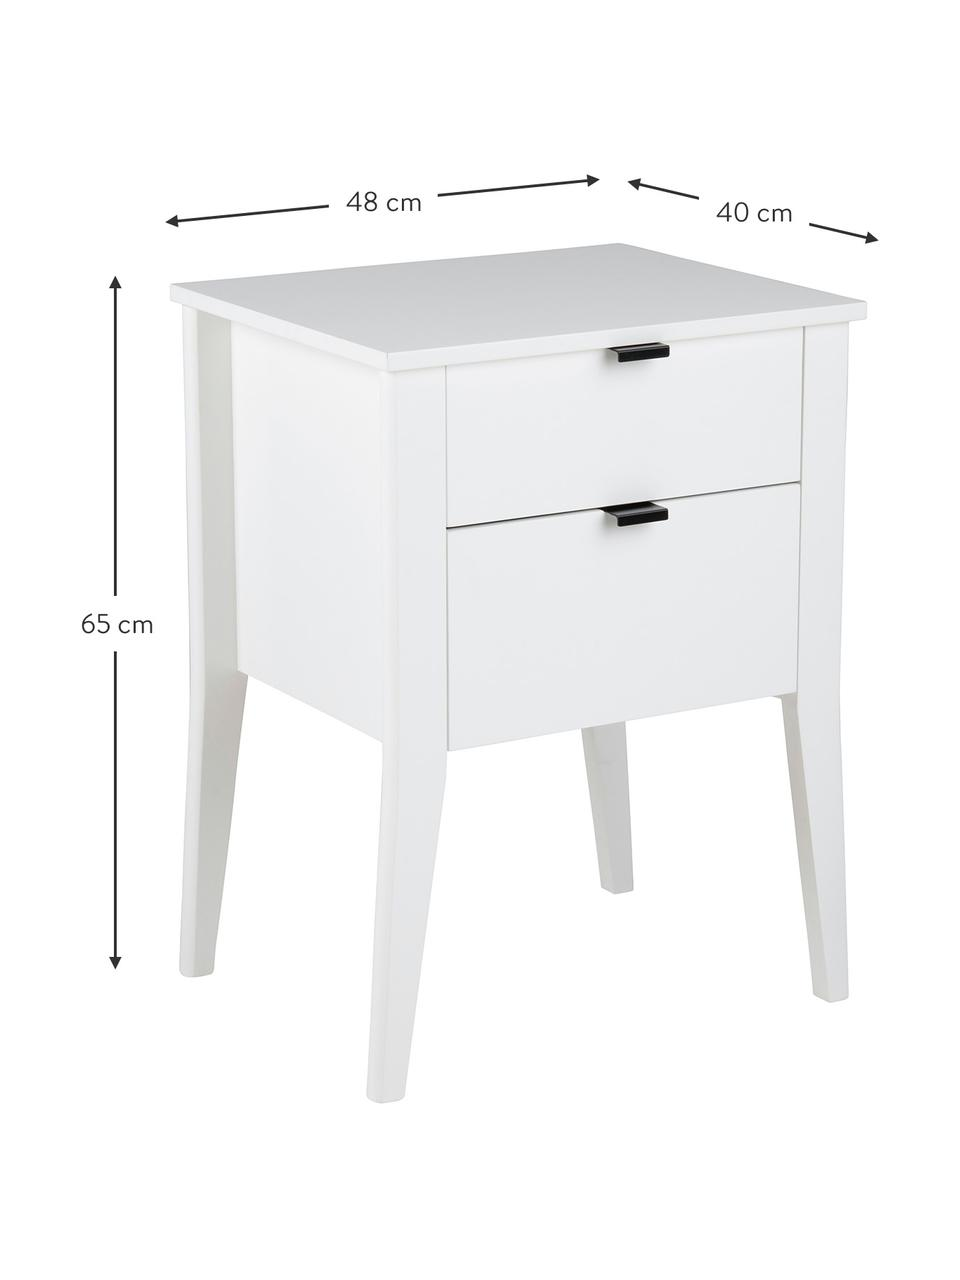 Table de chevet blanche avec 2 tiroirs Sleepy, Blanc